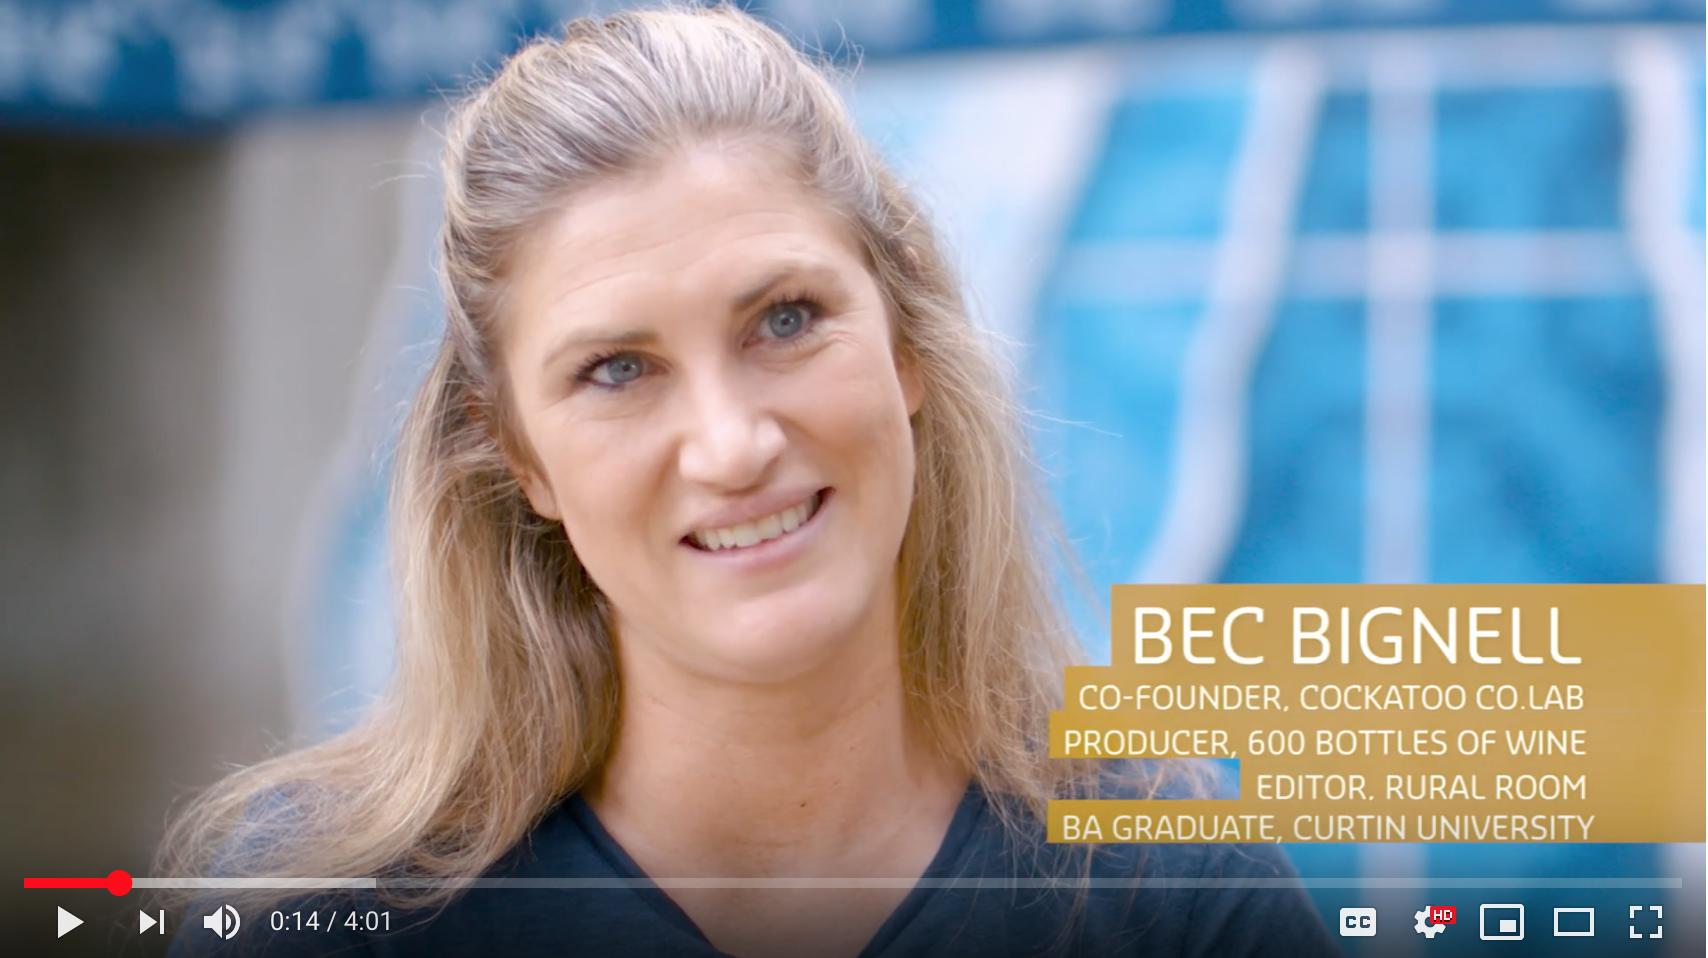 Bec Curtain U promo.png